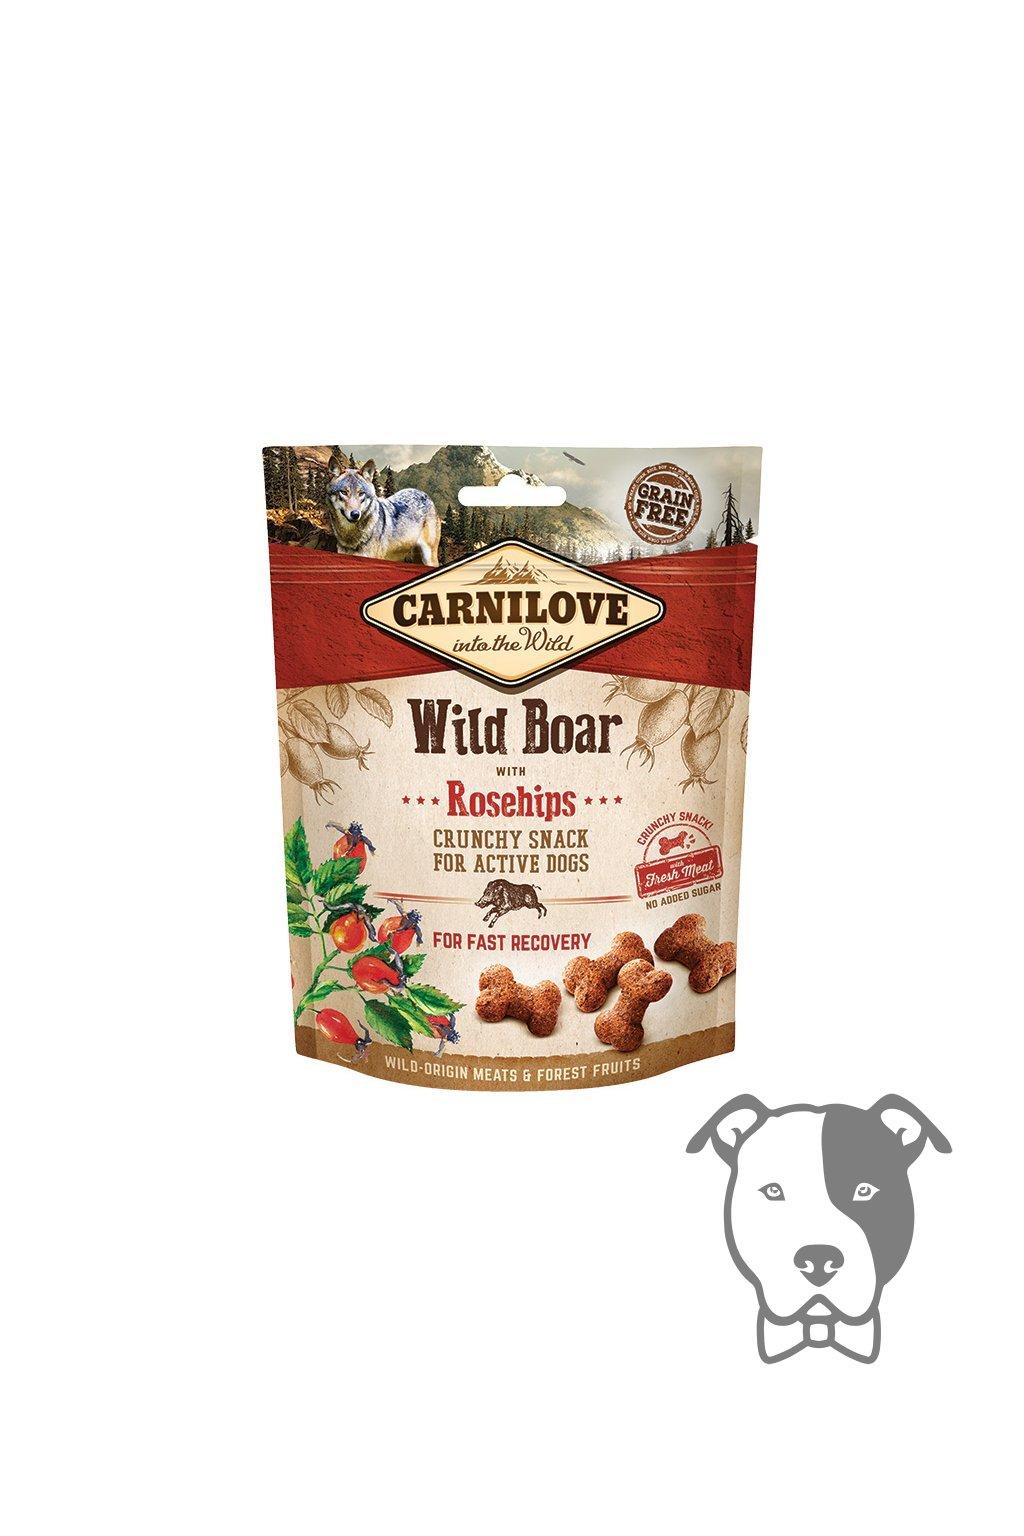 5624 carnilove dog crunchy snack wild boar with rosehips 200g original